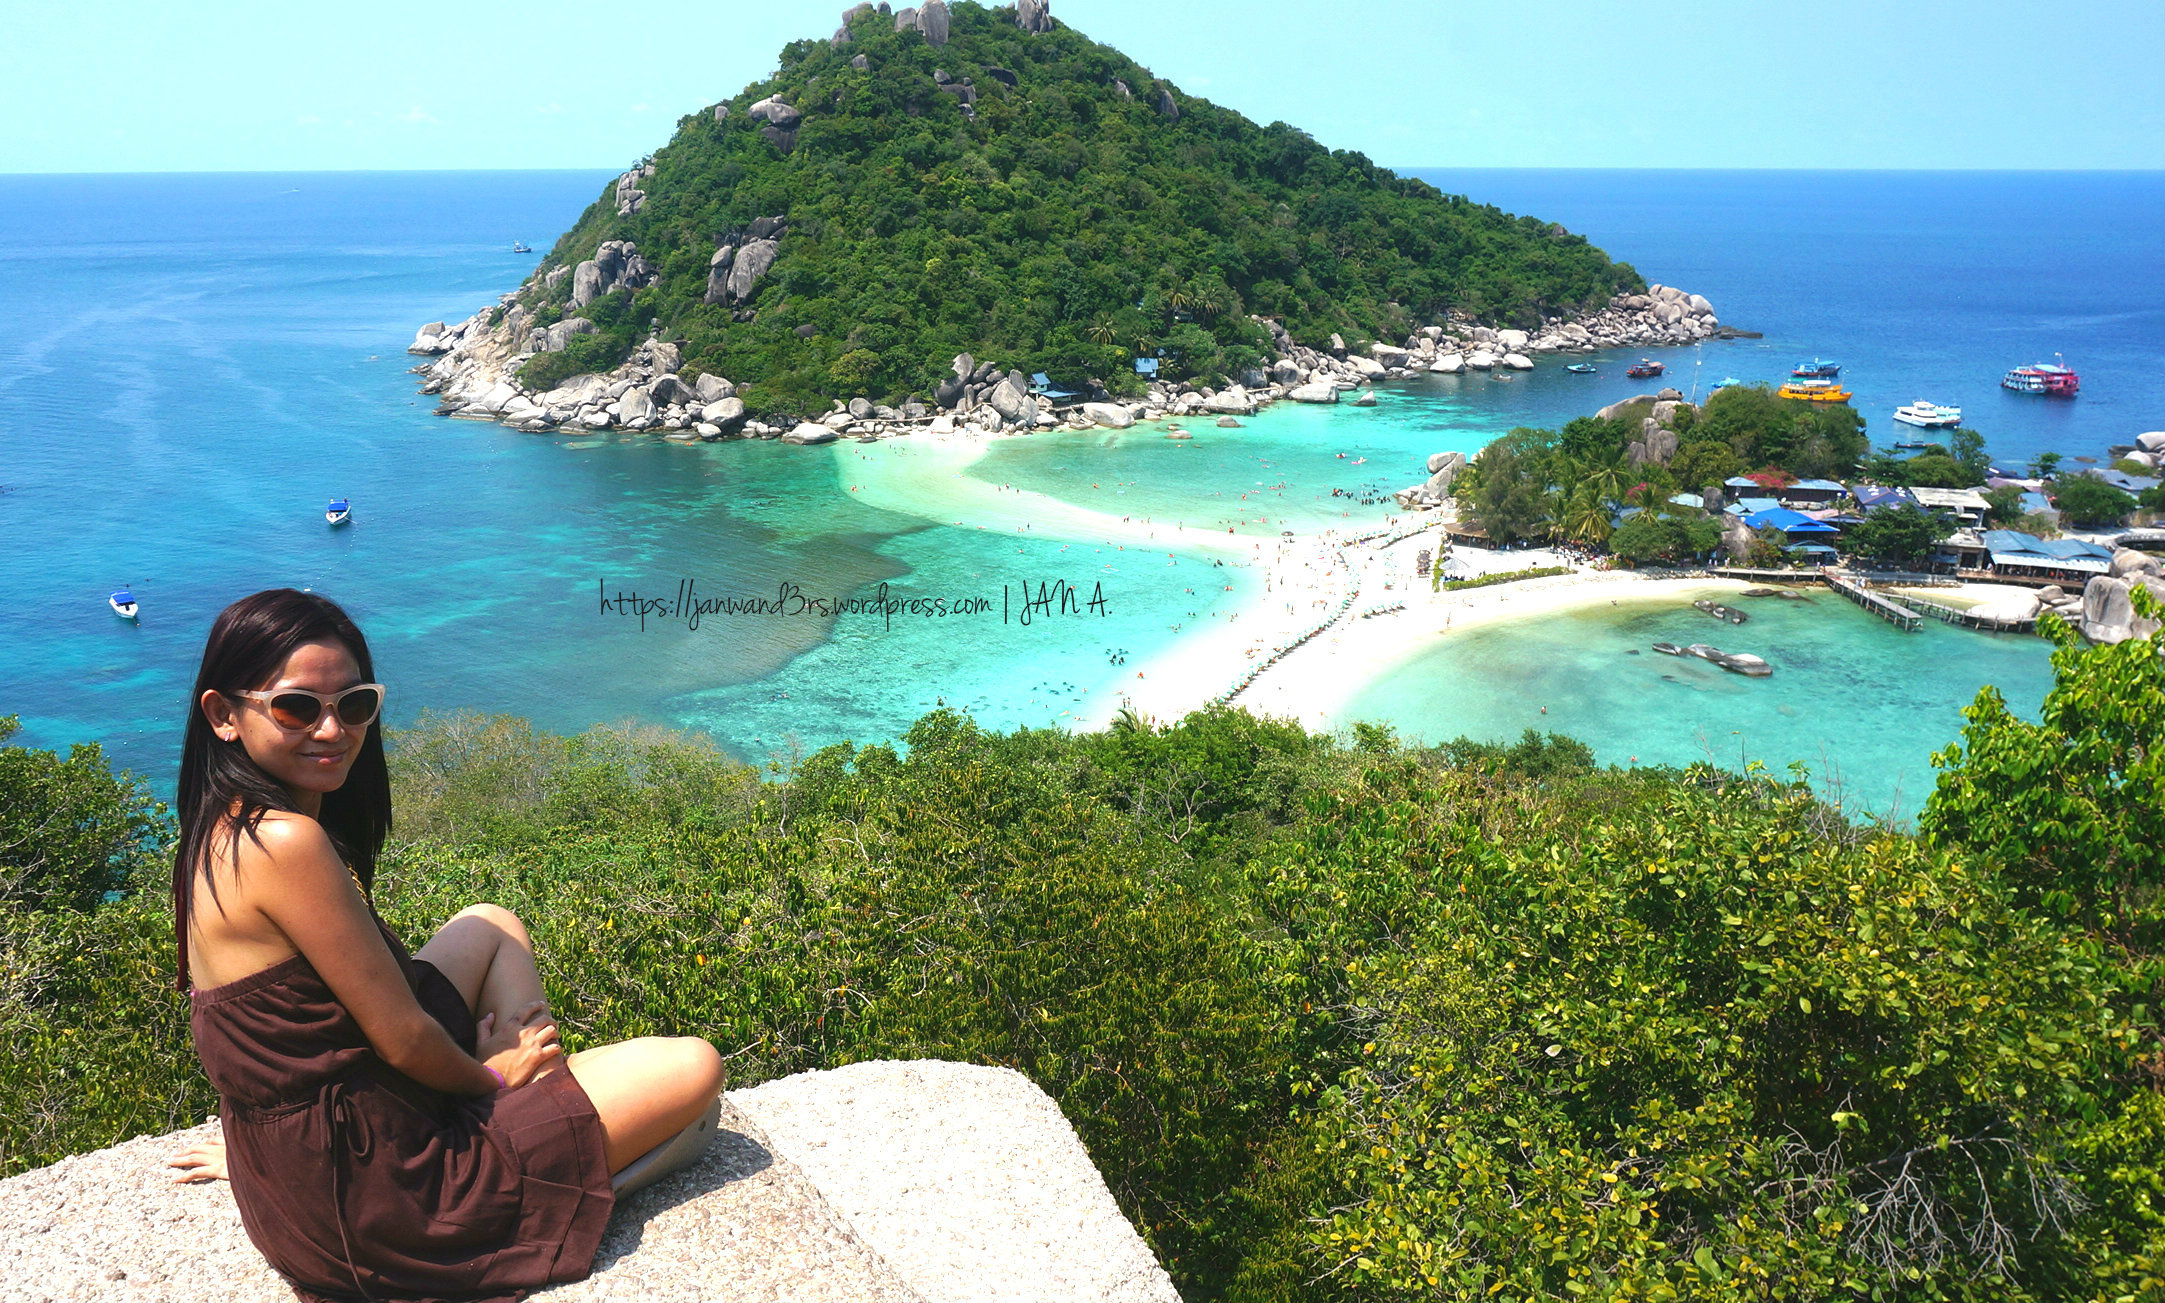 Koh Samet Thailand  City pictures : Summer 2015 Koh Samui, Thailand: Chaweng Beach, Koh Tao & Koh Nang ...